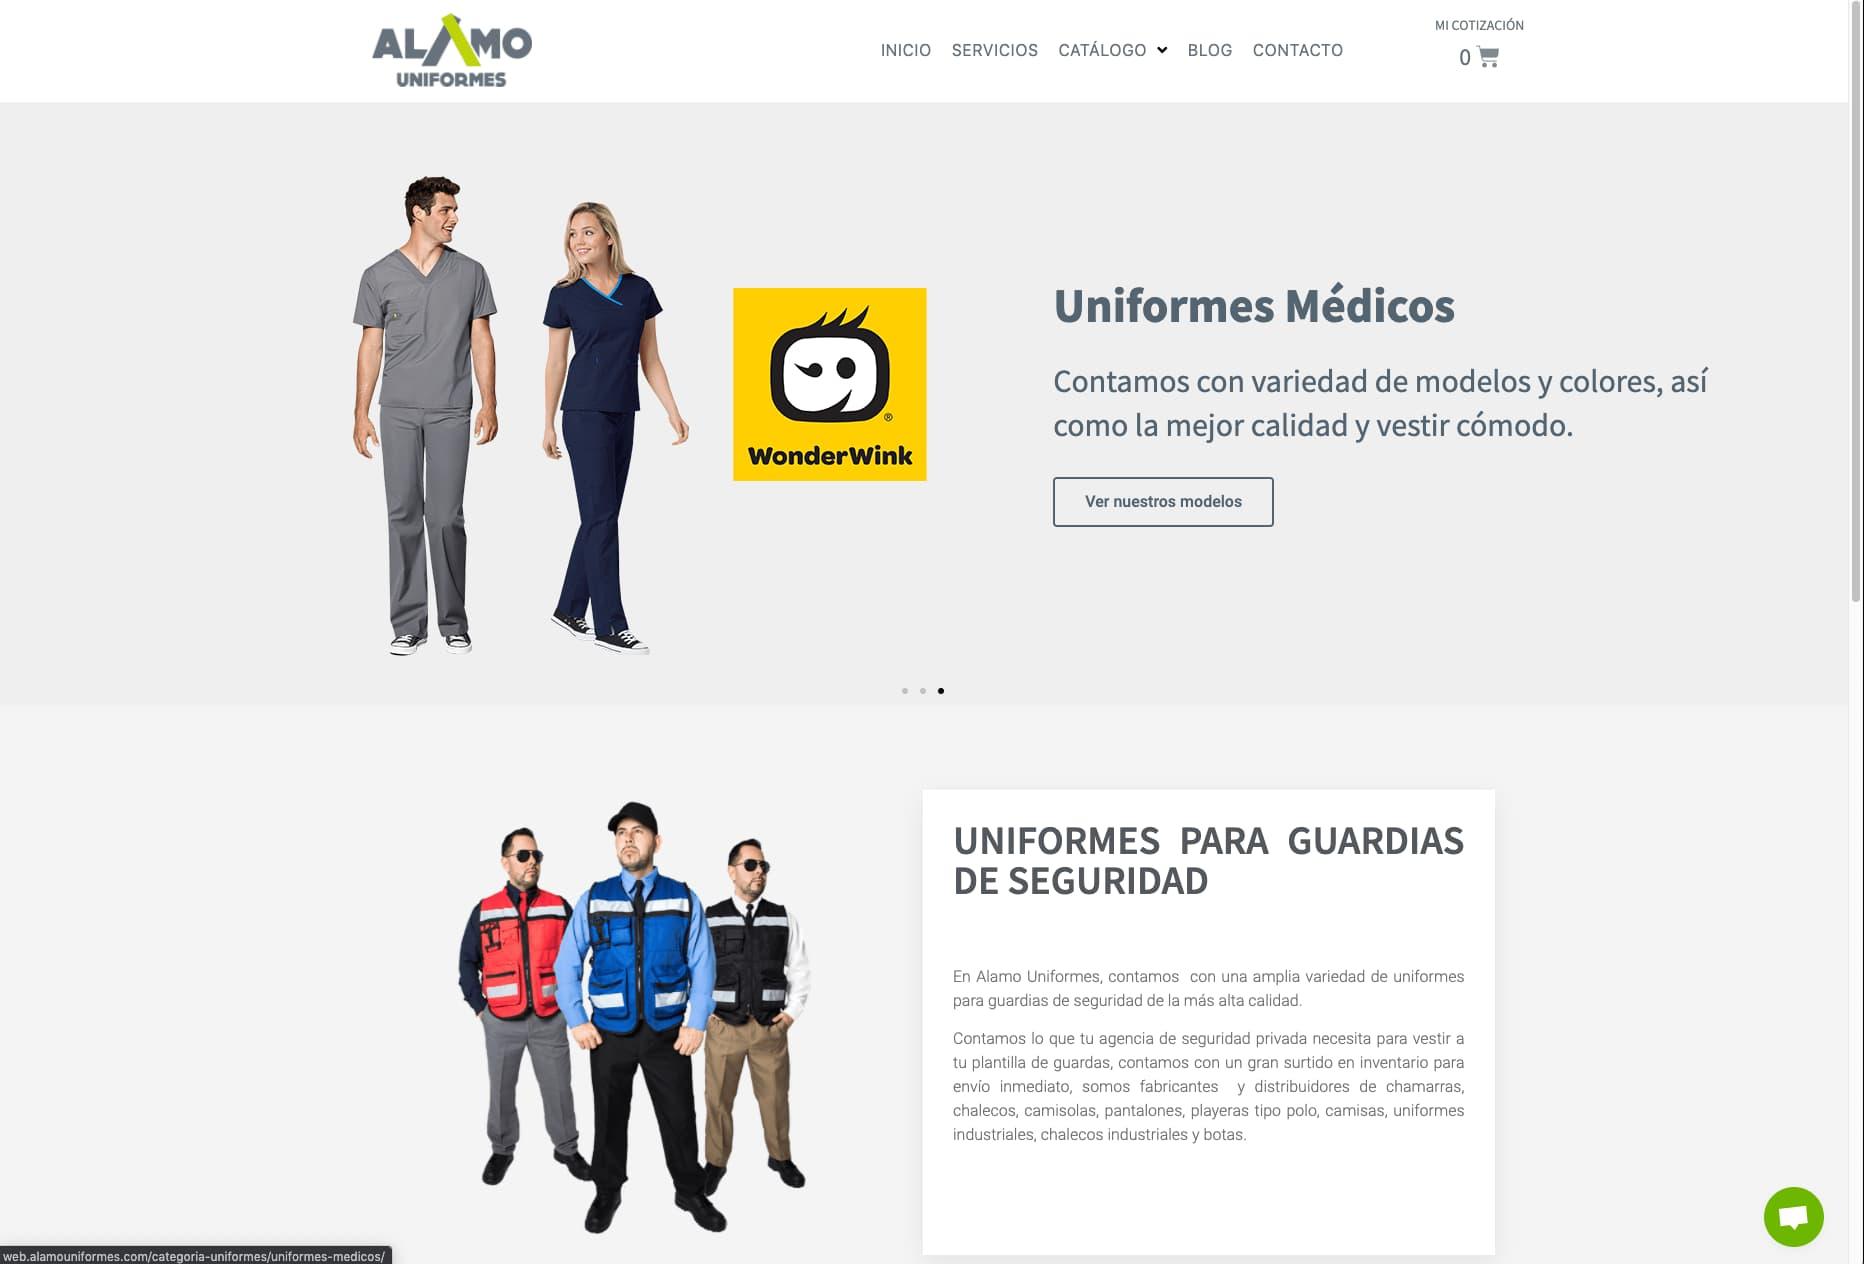 alamouniformes.com